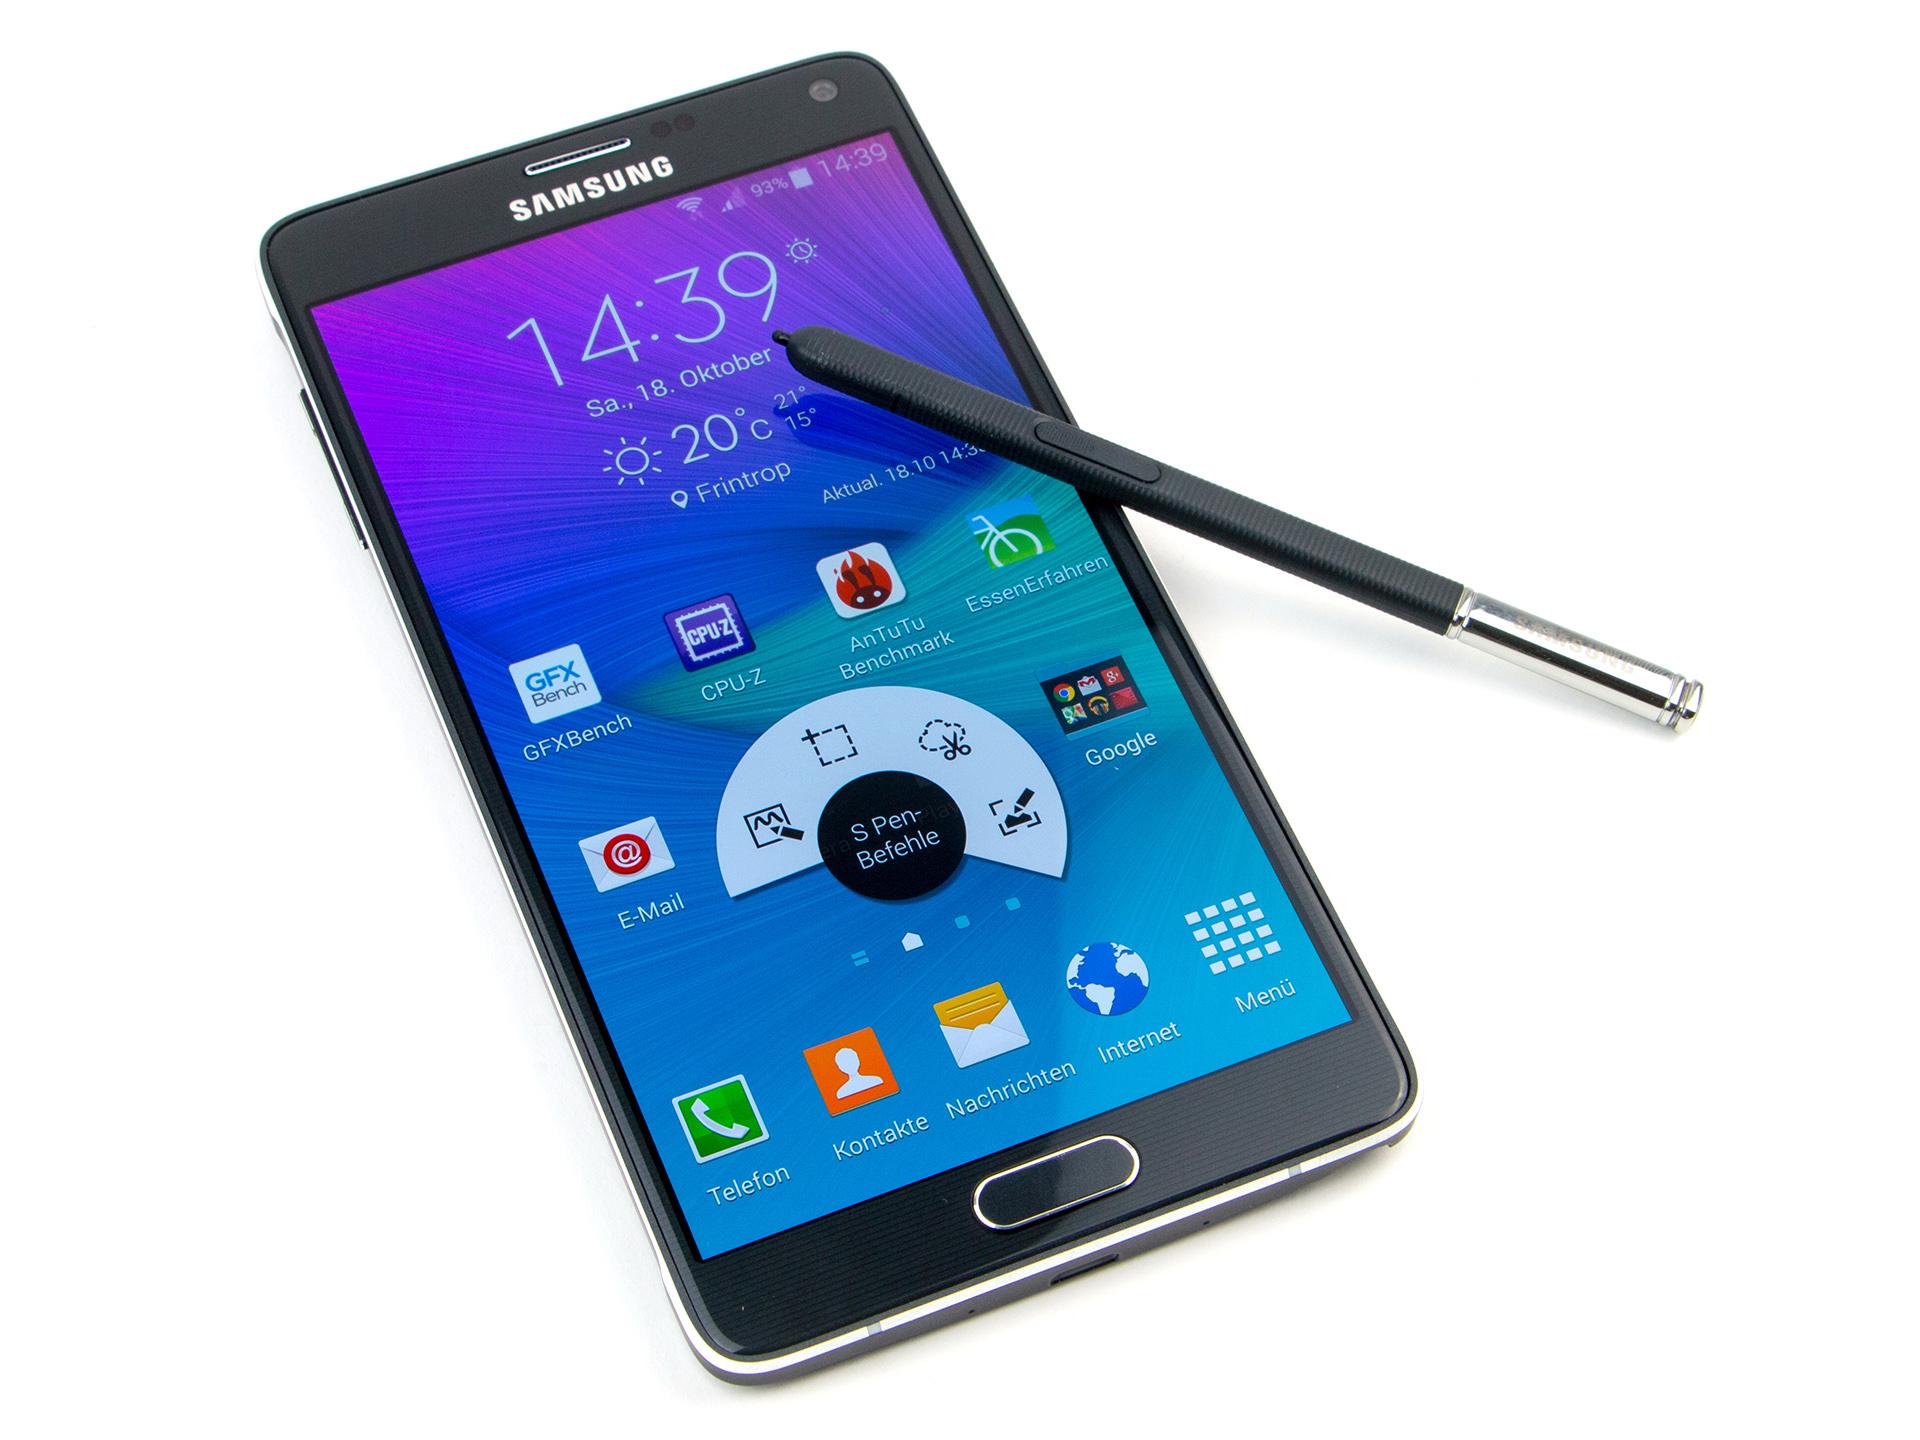 b9e7227cd62c6 Análisis completo del Smartphone Samsung Galaxy Note 4 (SM-N910F) -  Notebookcheck.org